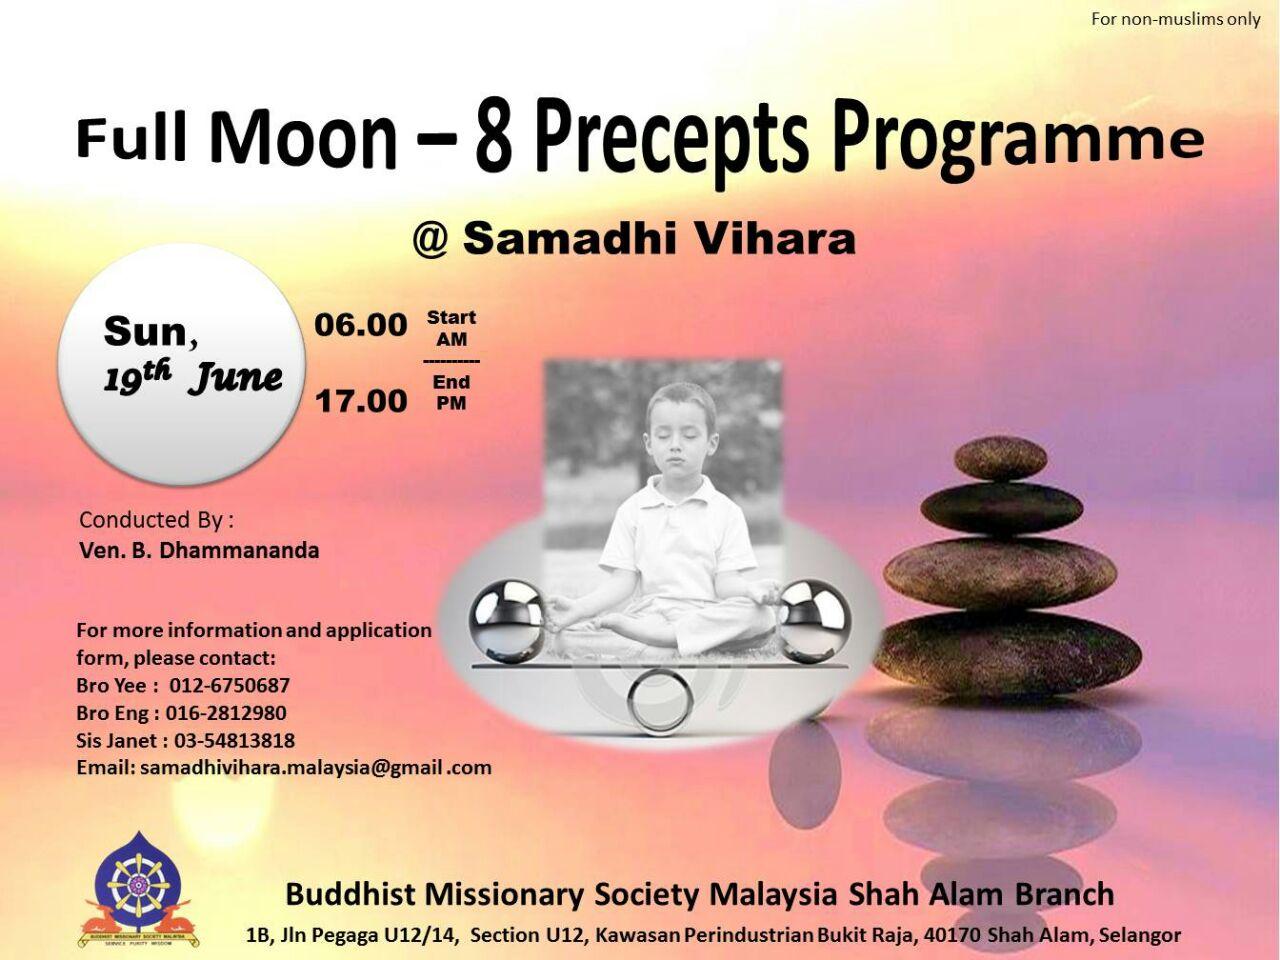 8 Precepts, 19 June 2016 (Sunday)